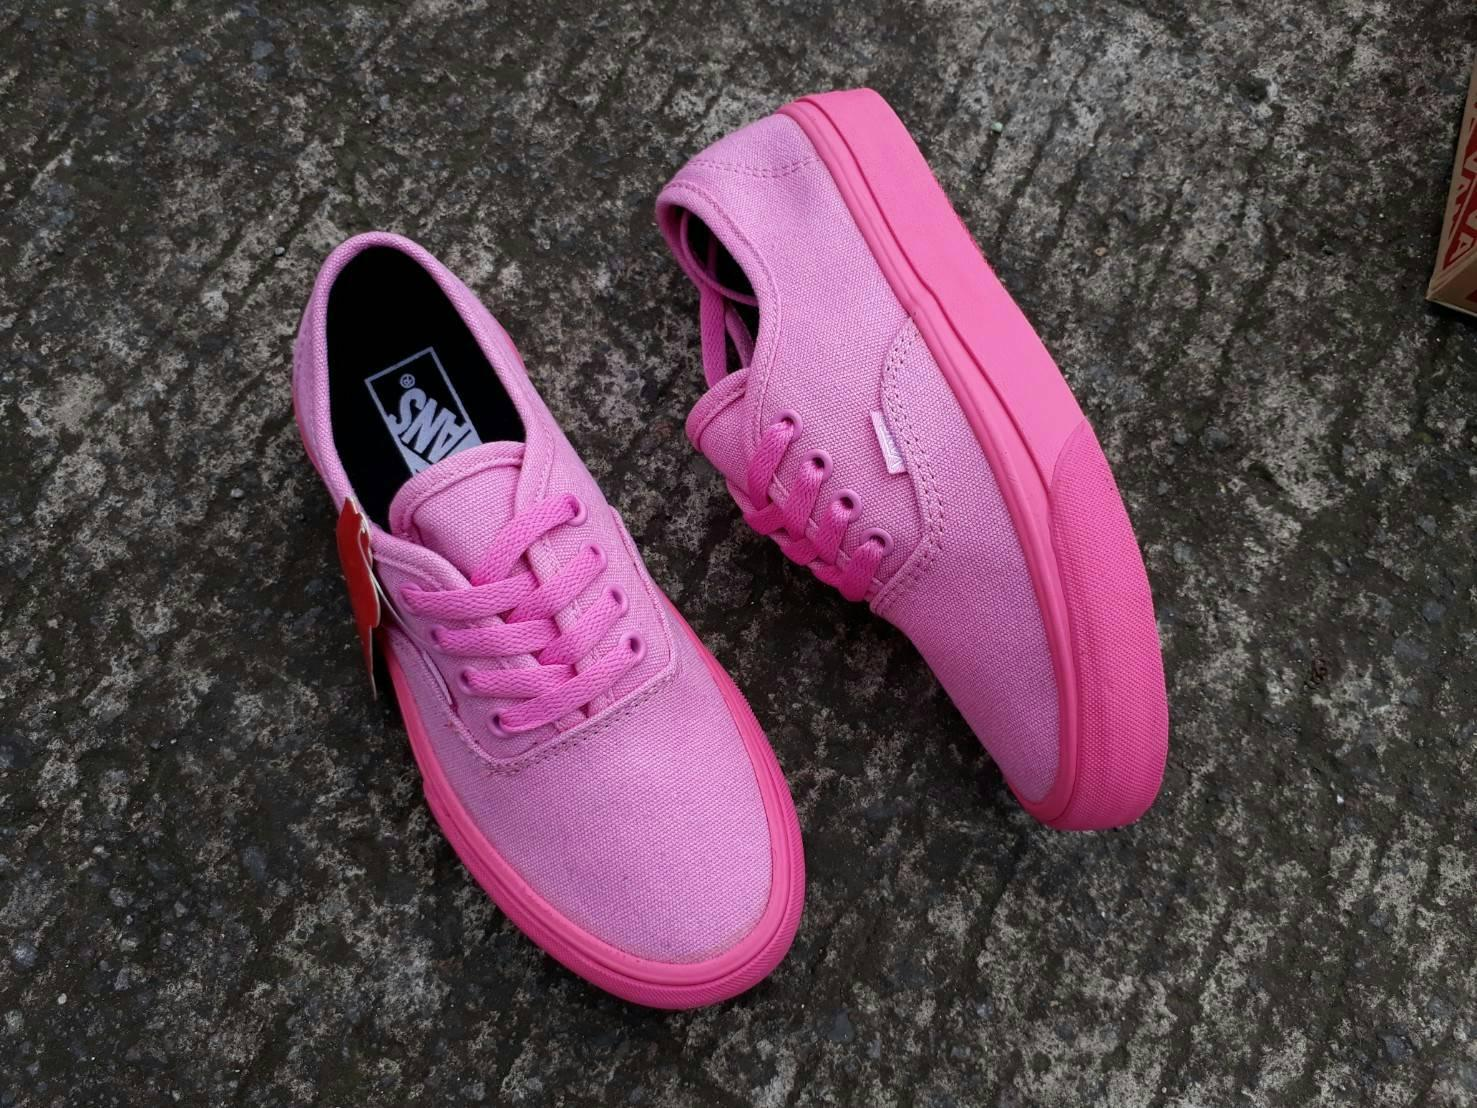 sepatu vans wanita authentic Full Pink waffle DT premium BNIB made in china